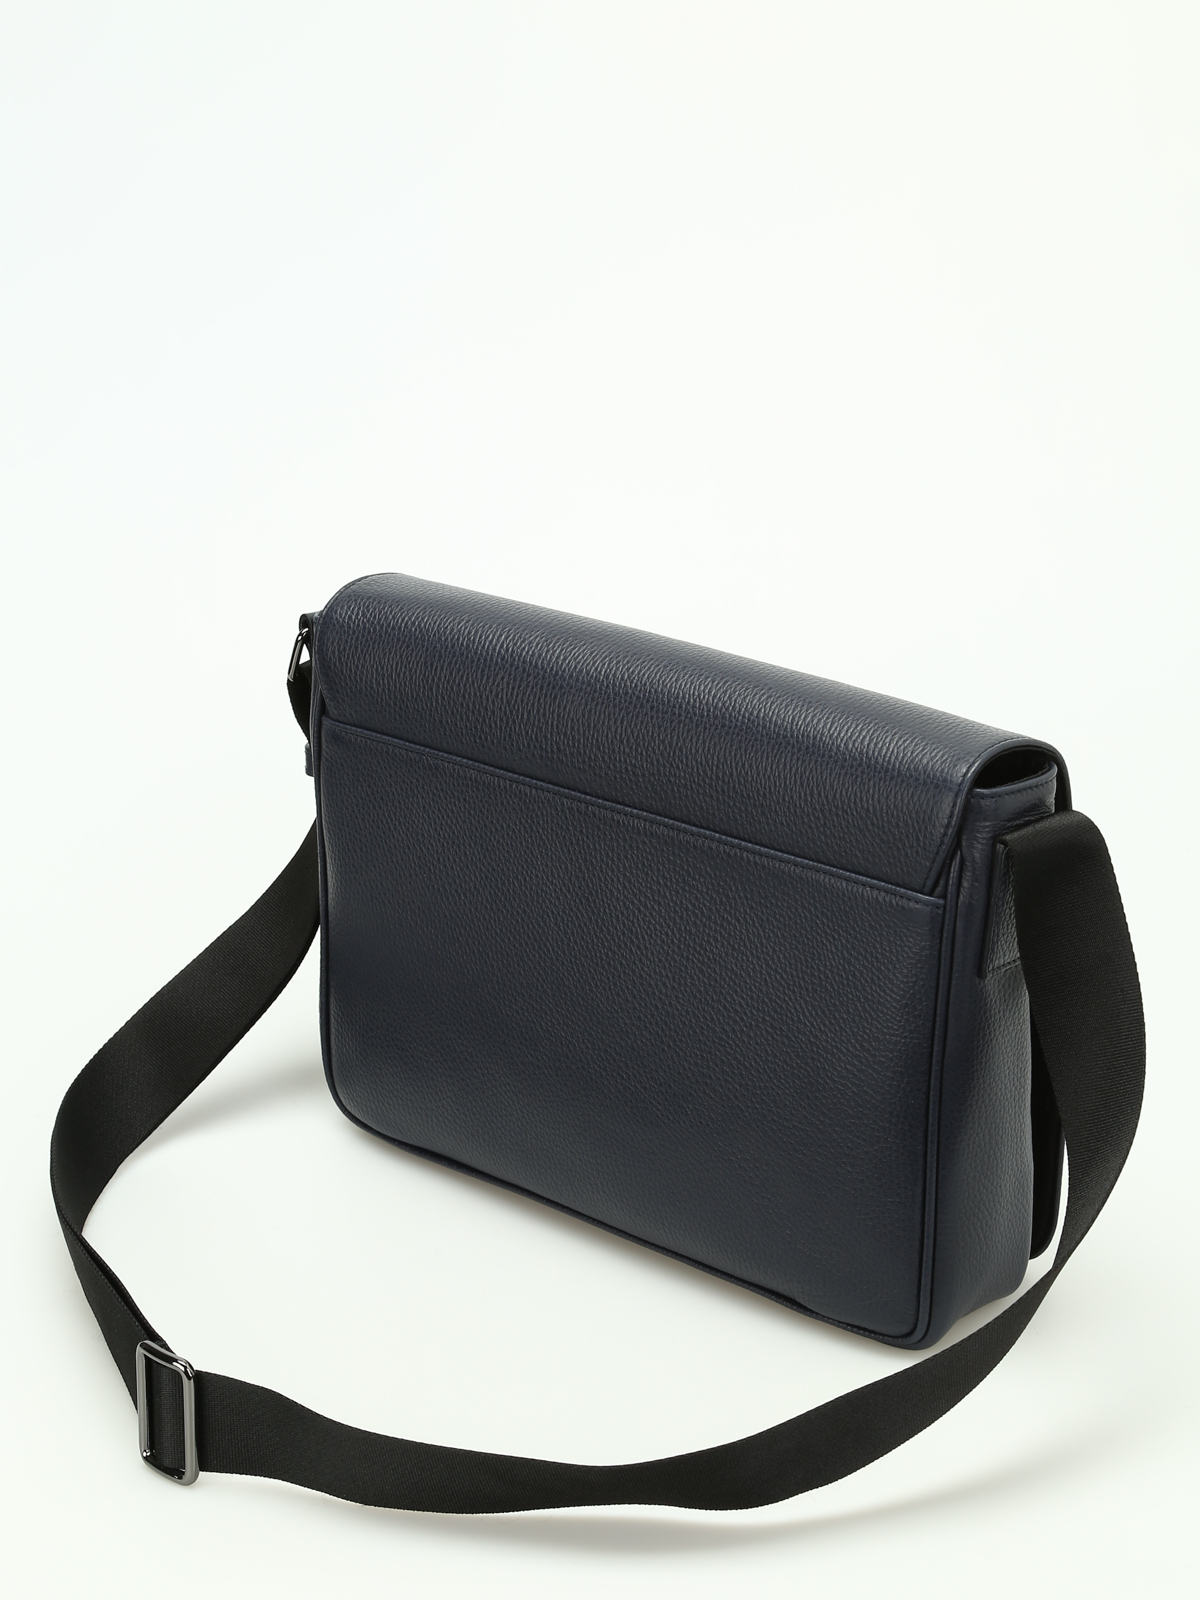 iKRIX ARMANI COLLEZIONI  shoulder bags - Hammered leather messenger bag 1b96778714be4